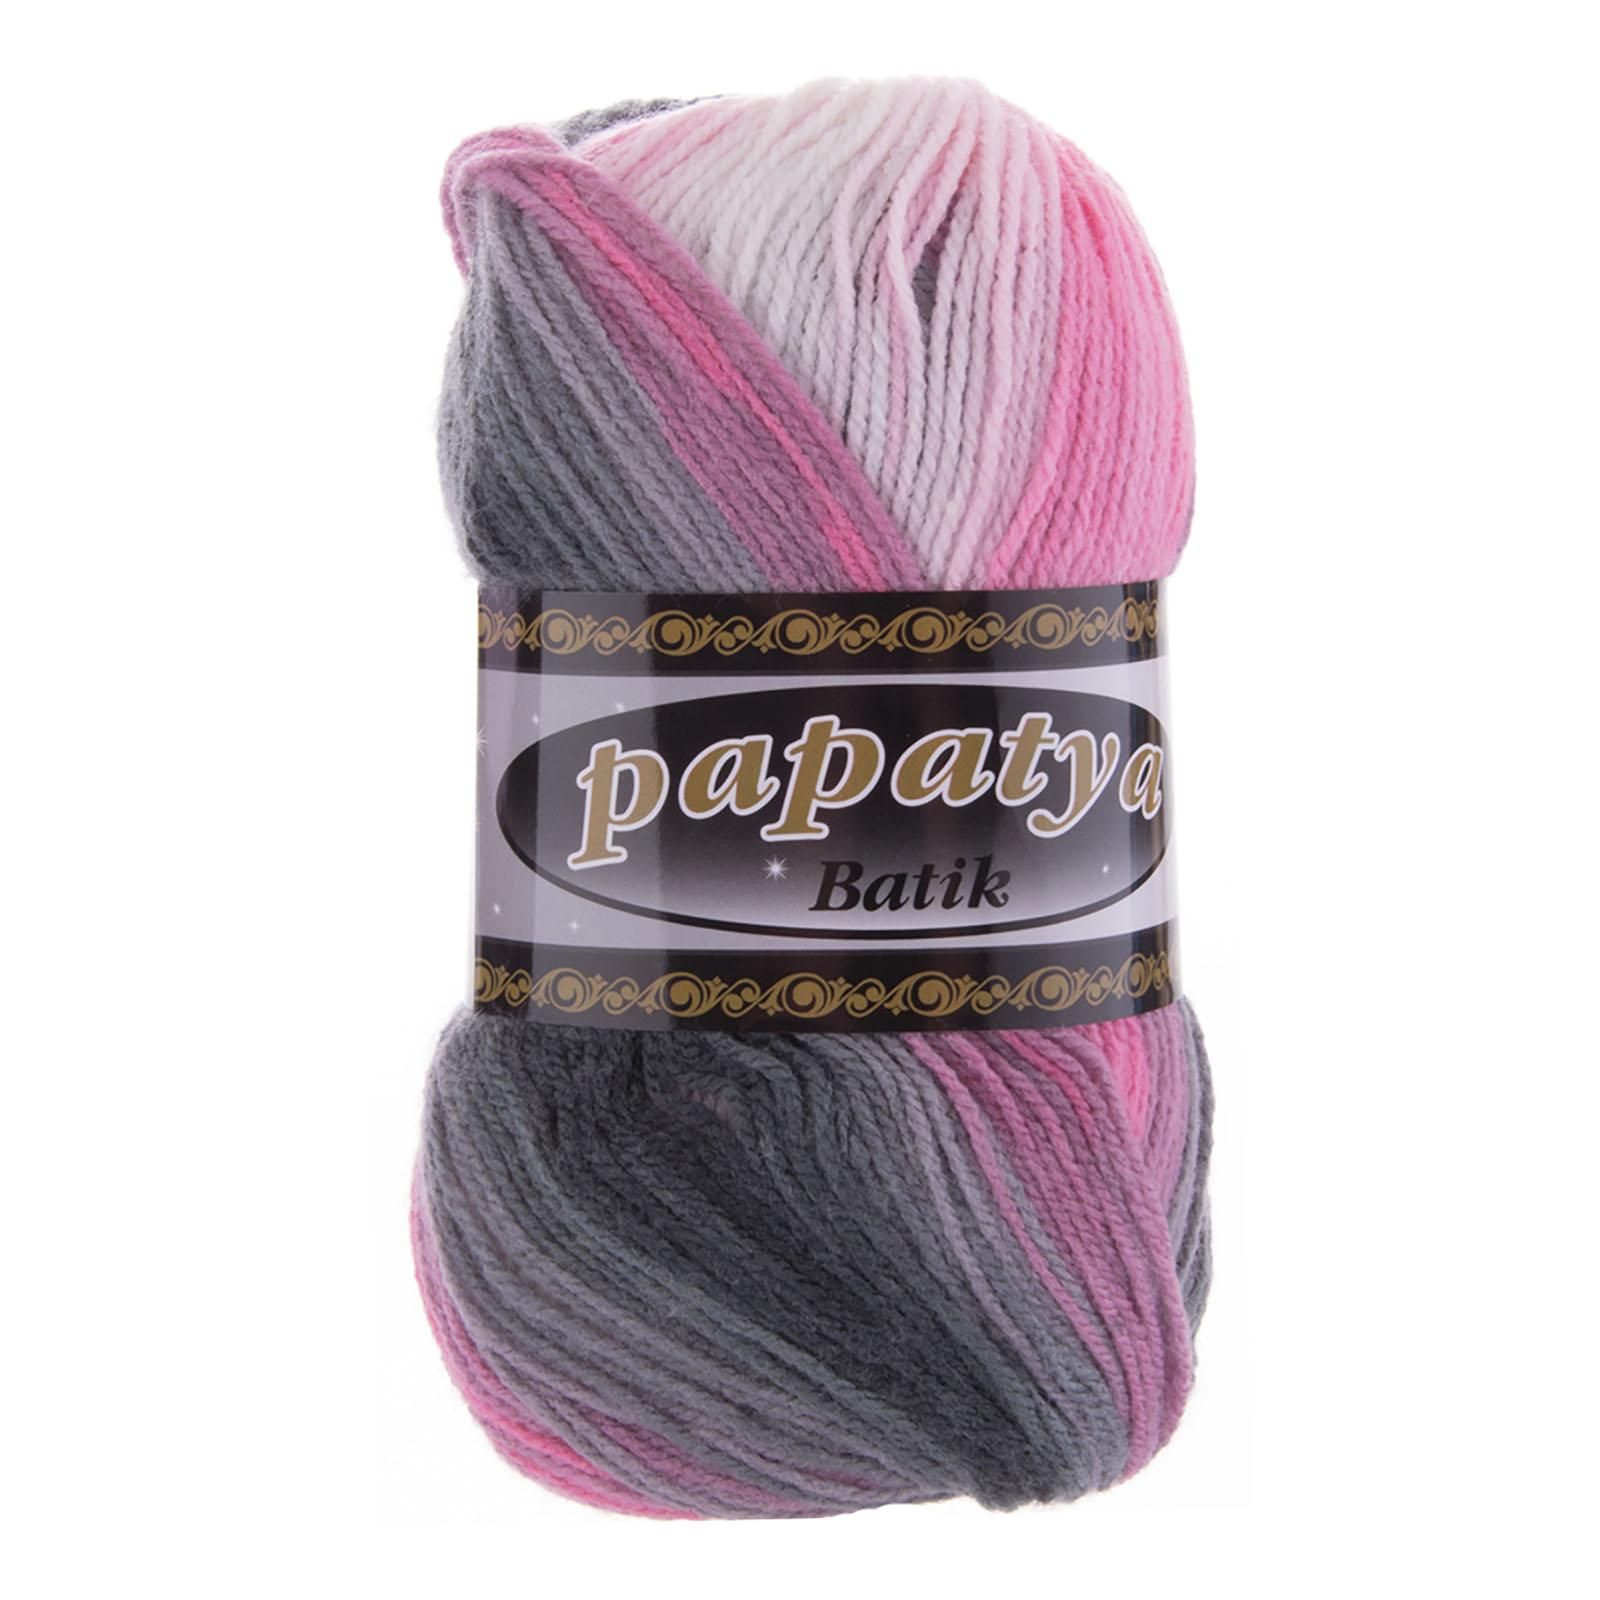 100g Farbverlaufsgarn Papatya Batik Strick-Wolle Strickgarn Häkelgarn Farbwahl – Bild 8